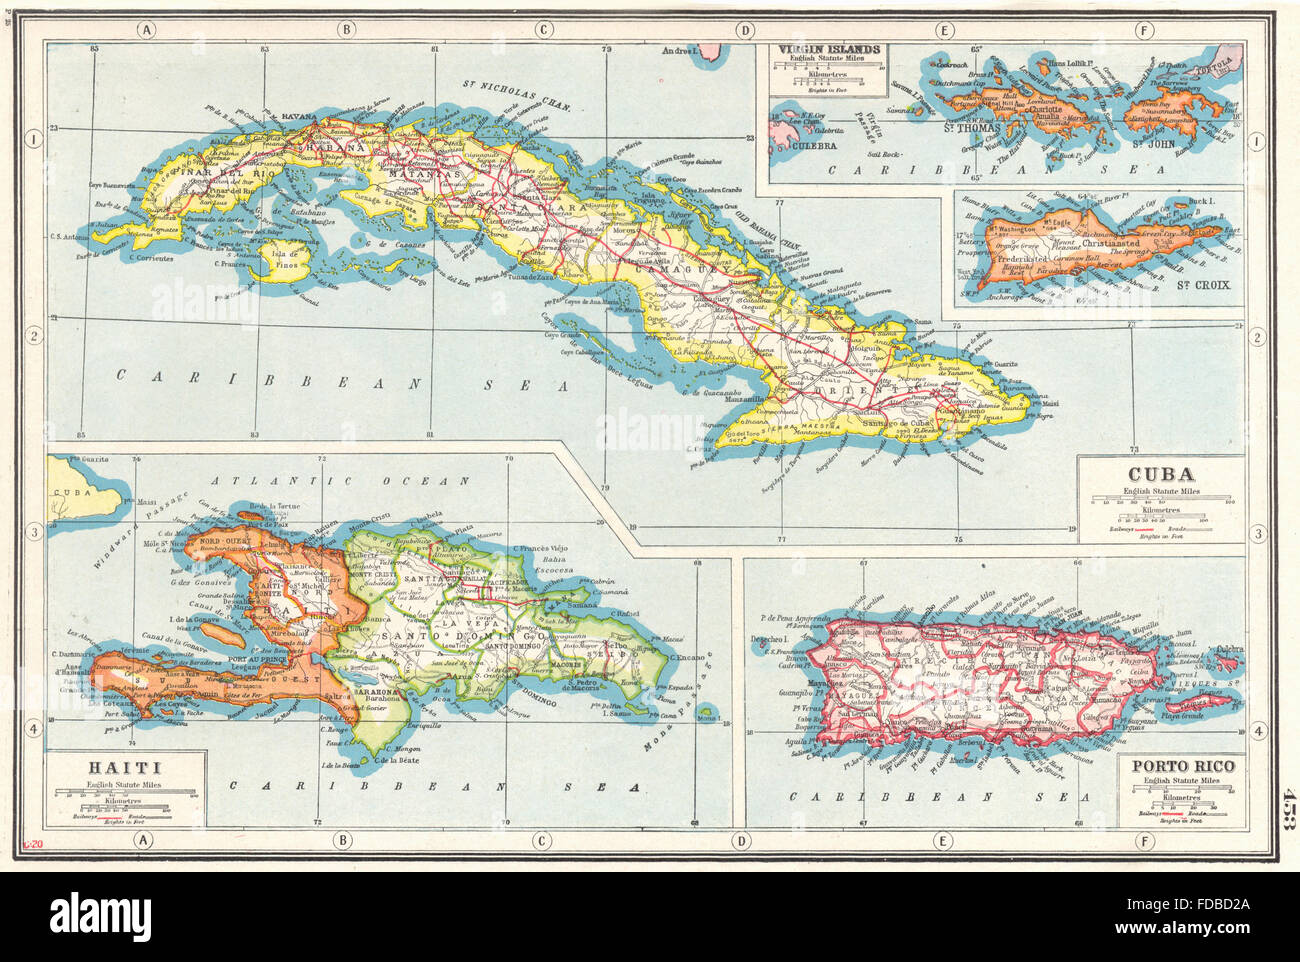 WEST INDIES:Cuba Puerto Rico Hispaniola Virgin Islands St Croix ...